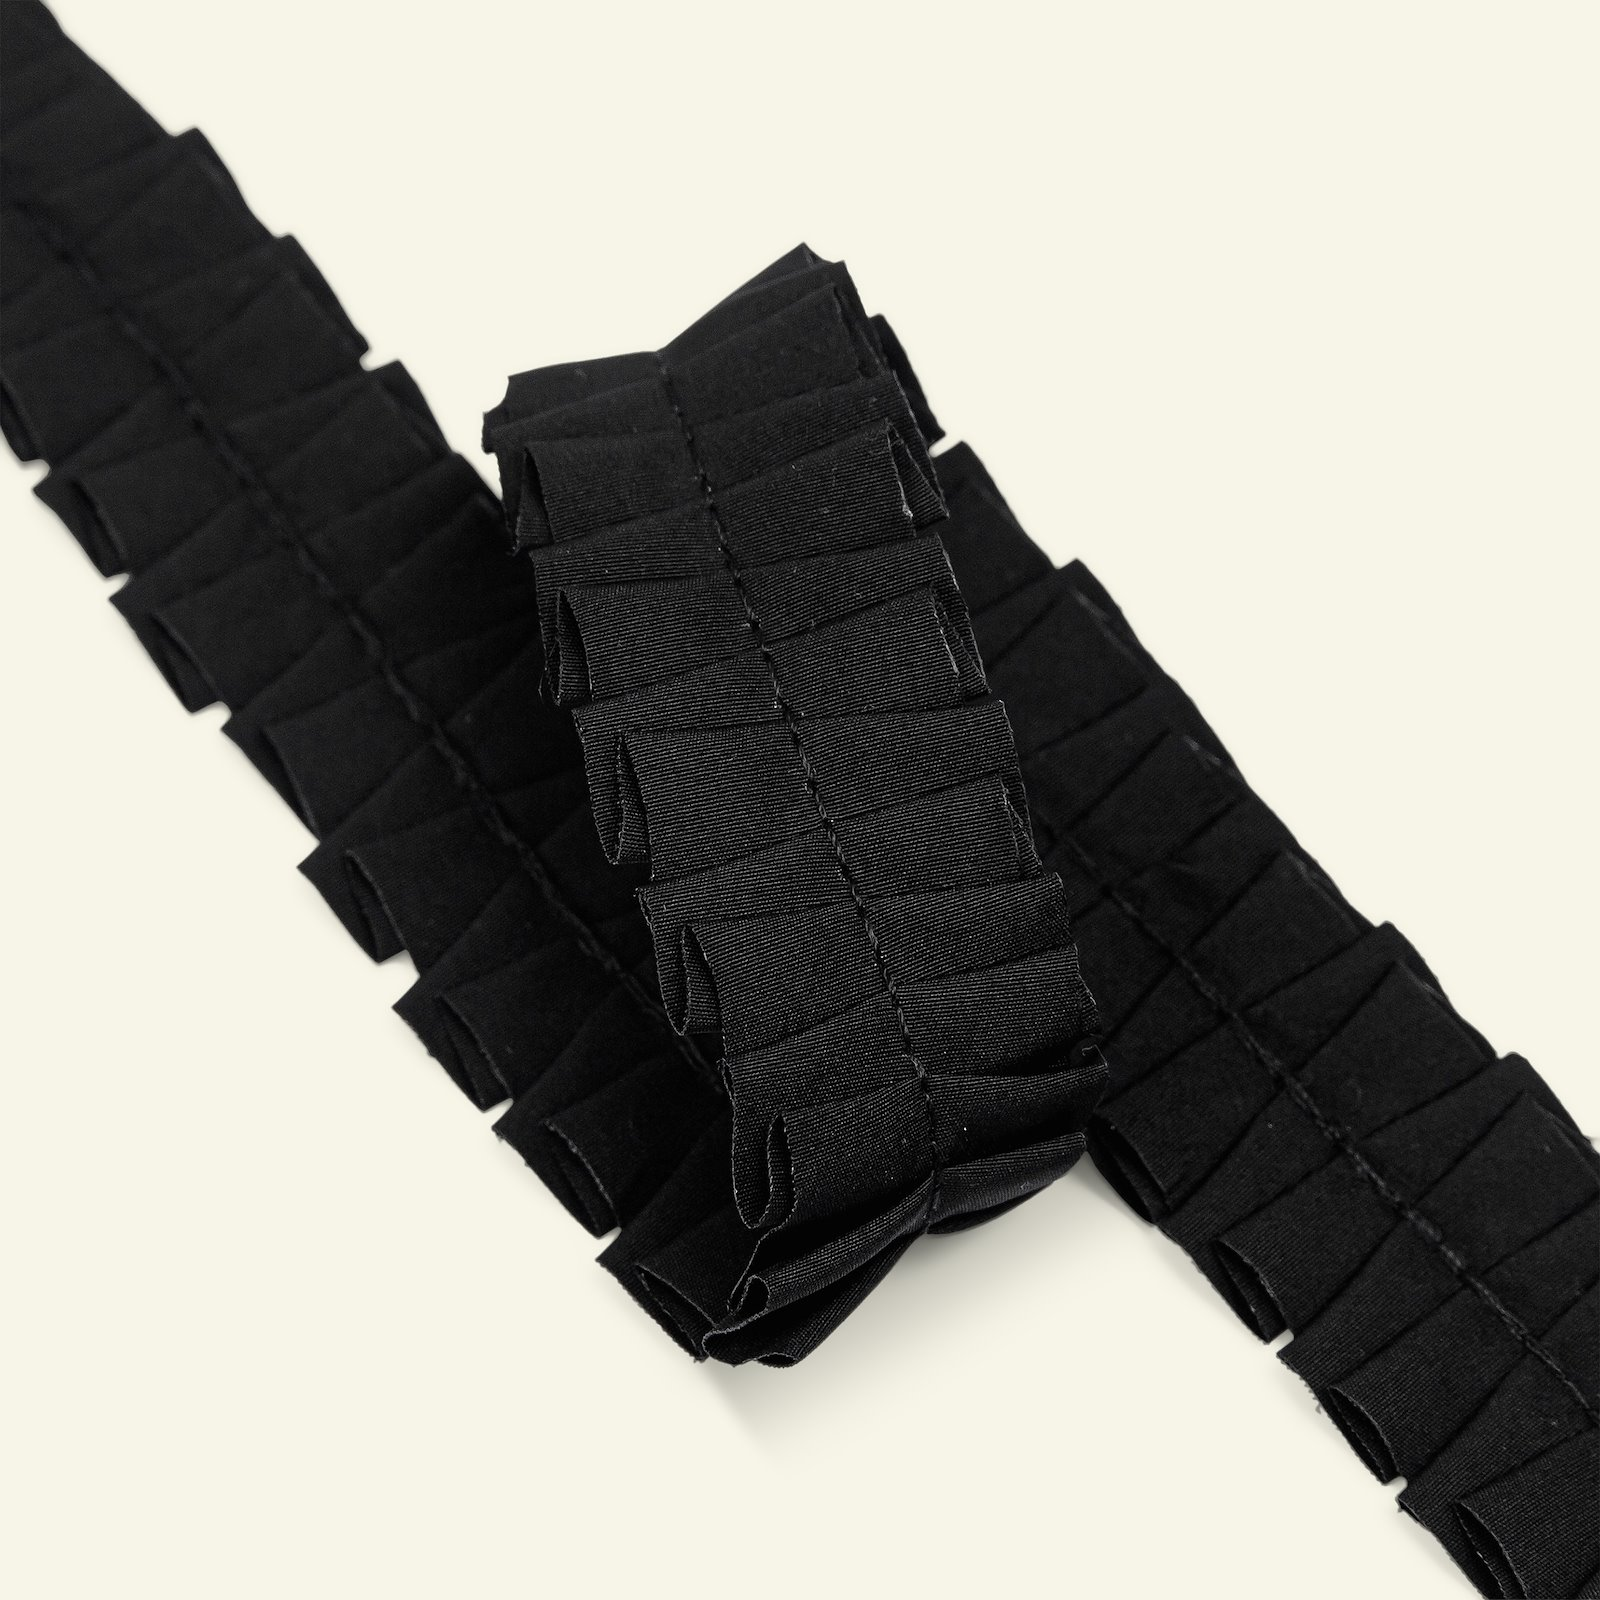 Ribbon ruffle 25mm black 2m 21483_pack